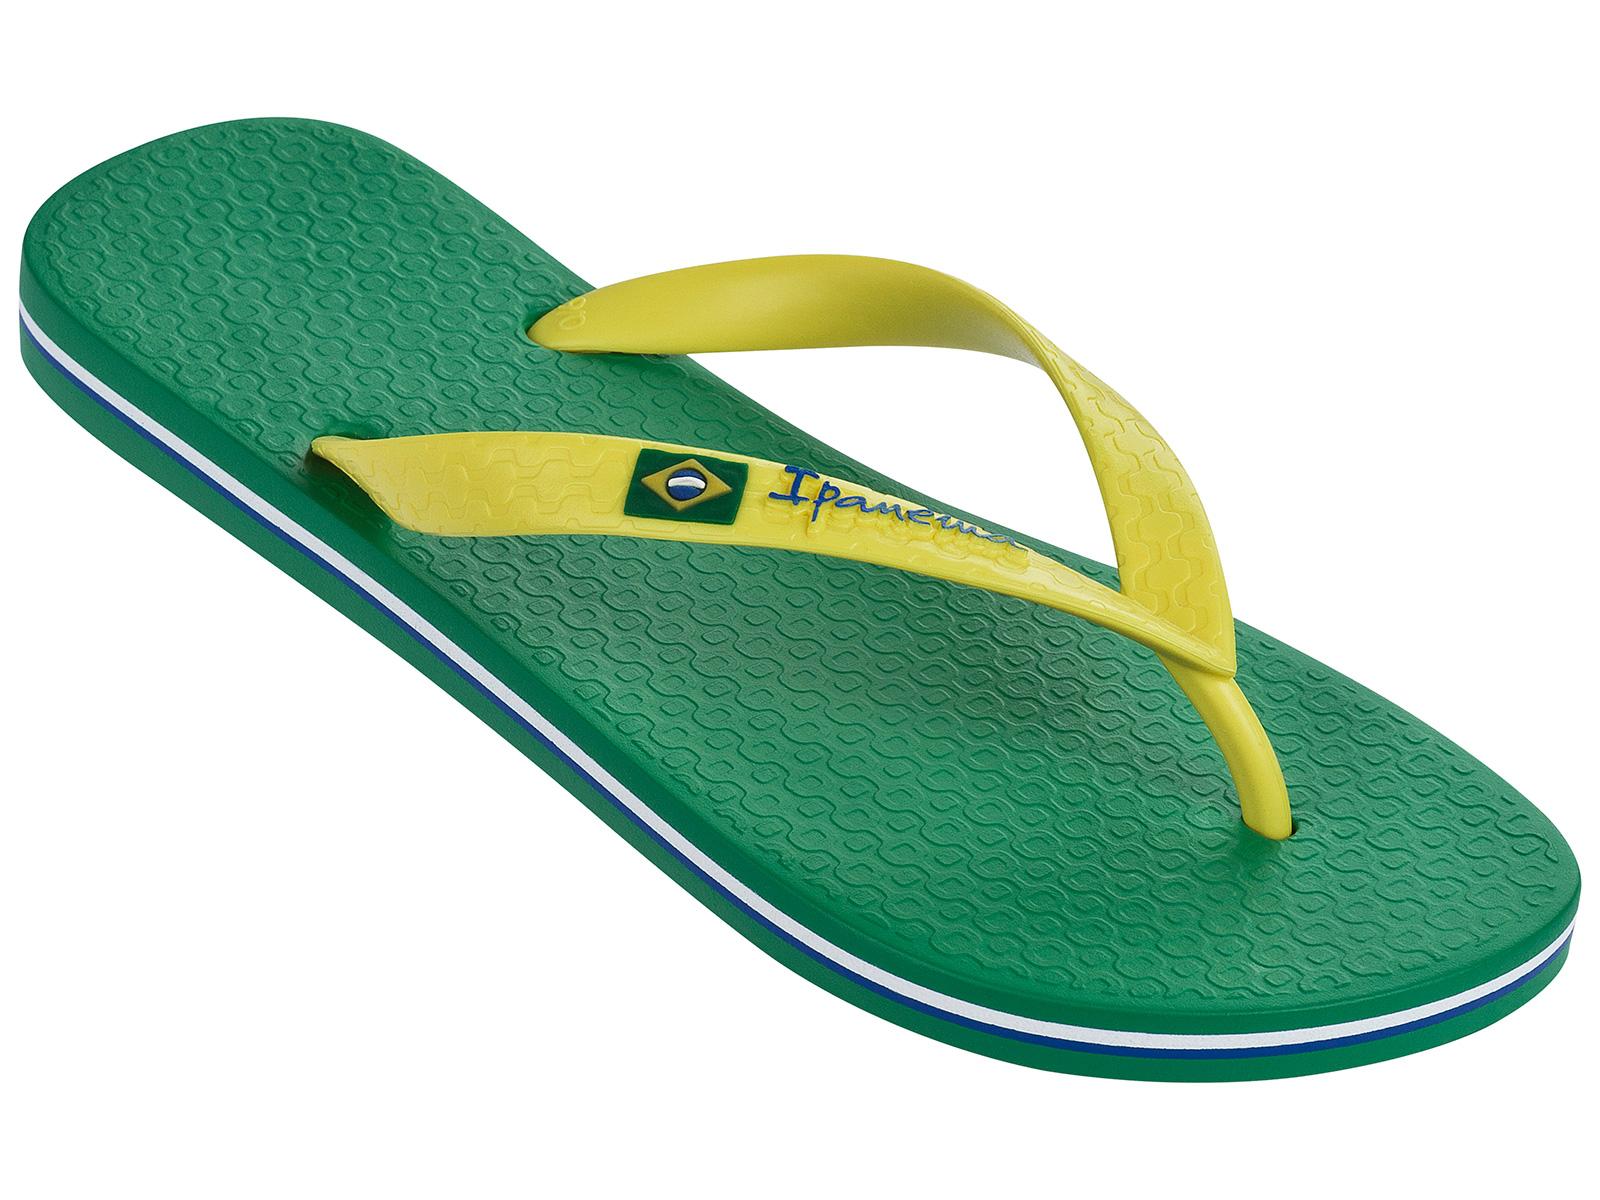 ipanema flip flops ipanema classica brasil ii ad green yellow. Black Bedroom Furniture Sets. Home Design Ideas